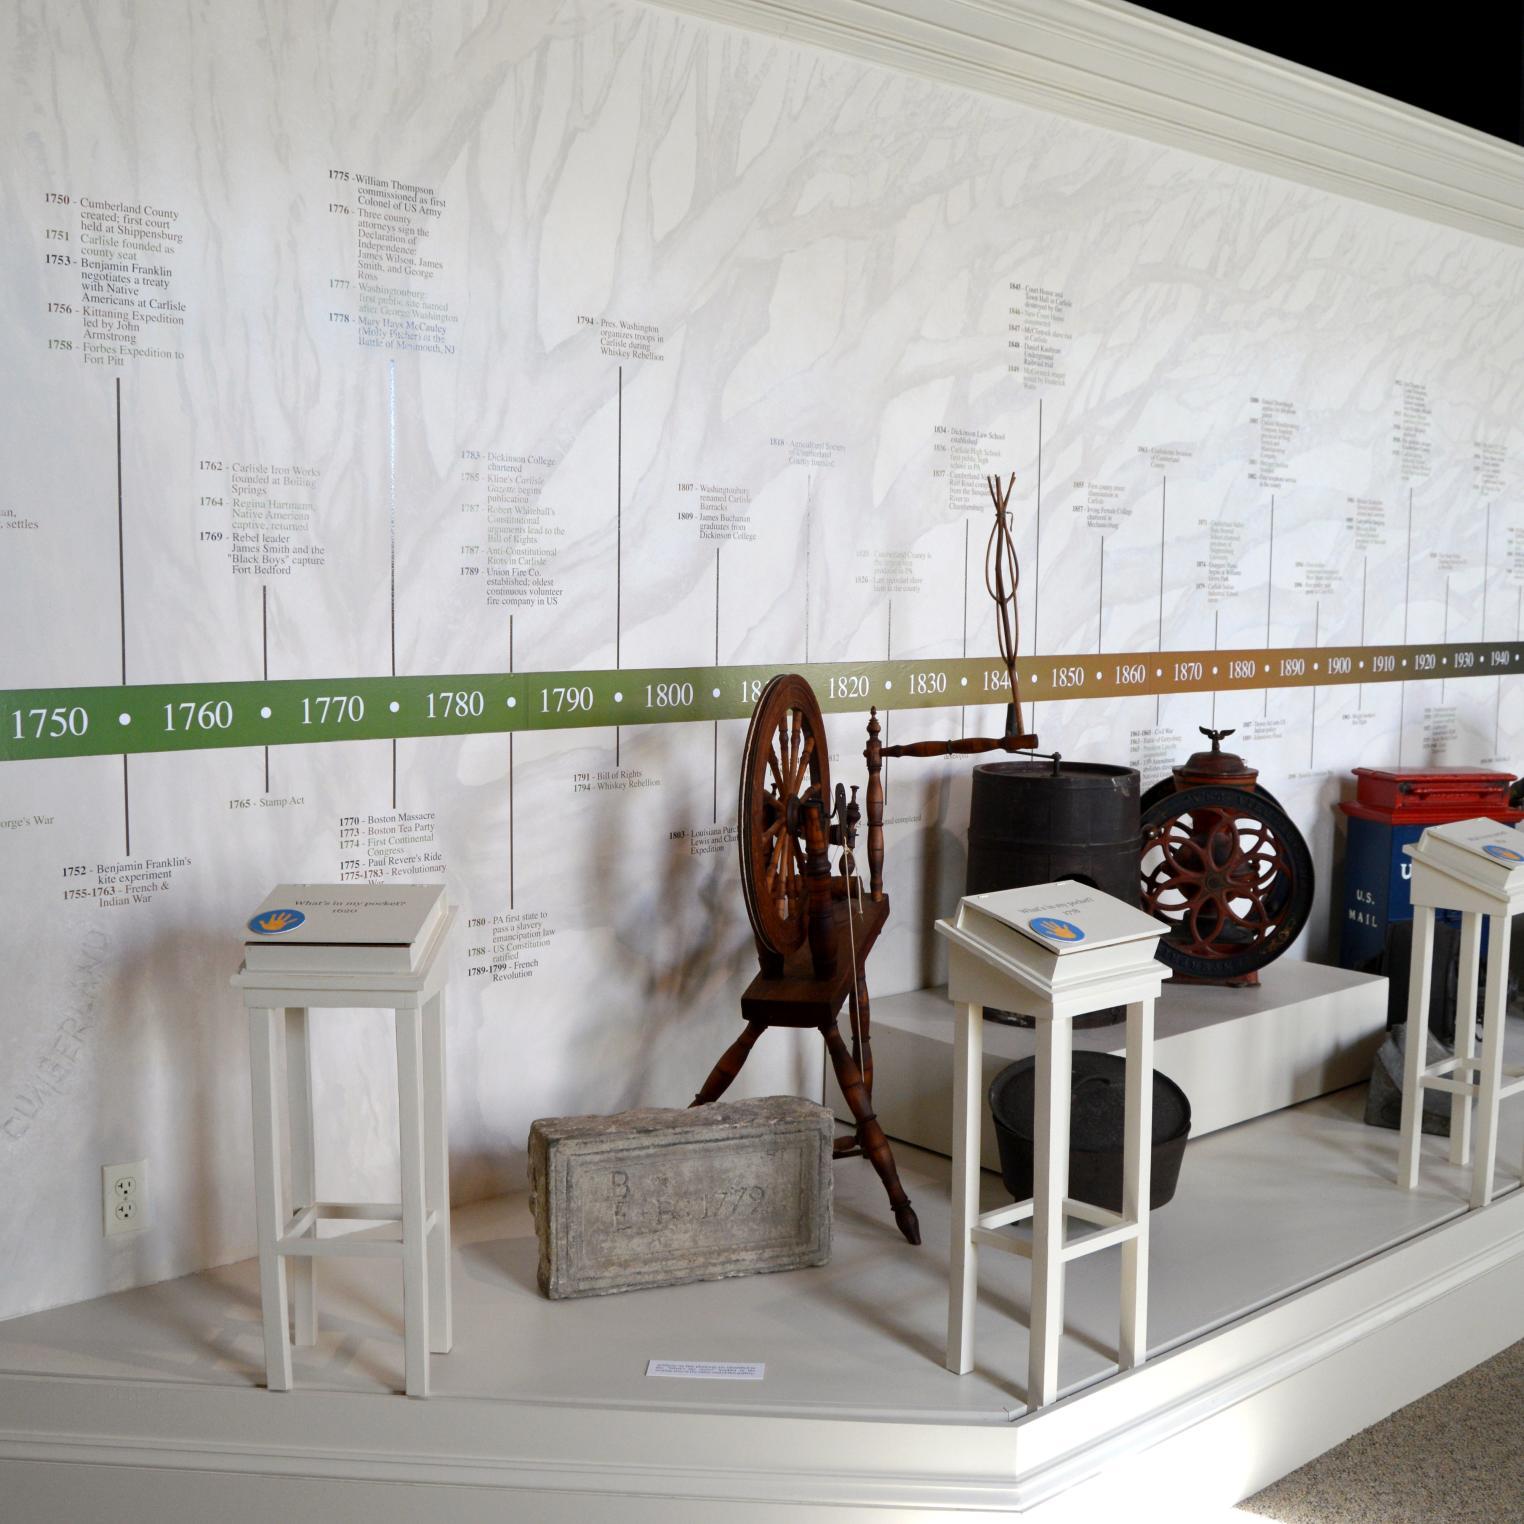 CCHS Museum Timeline